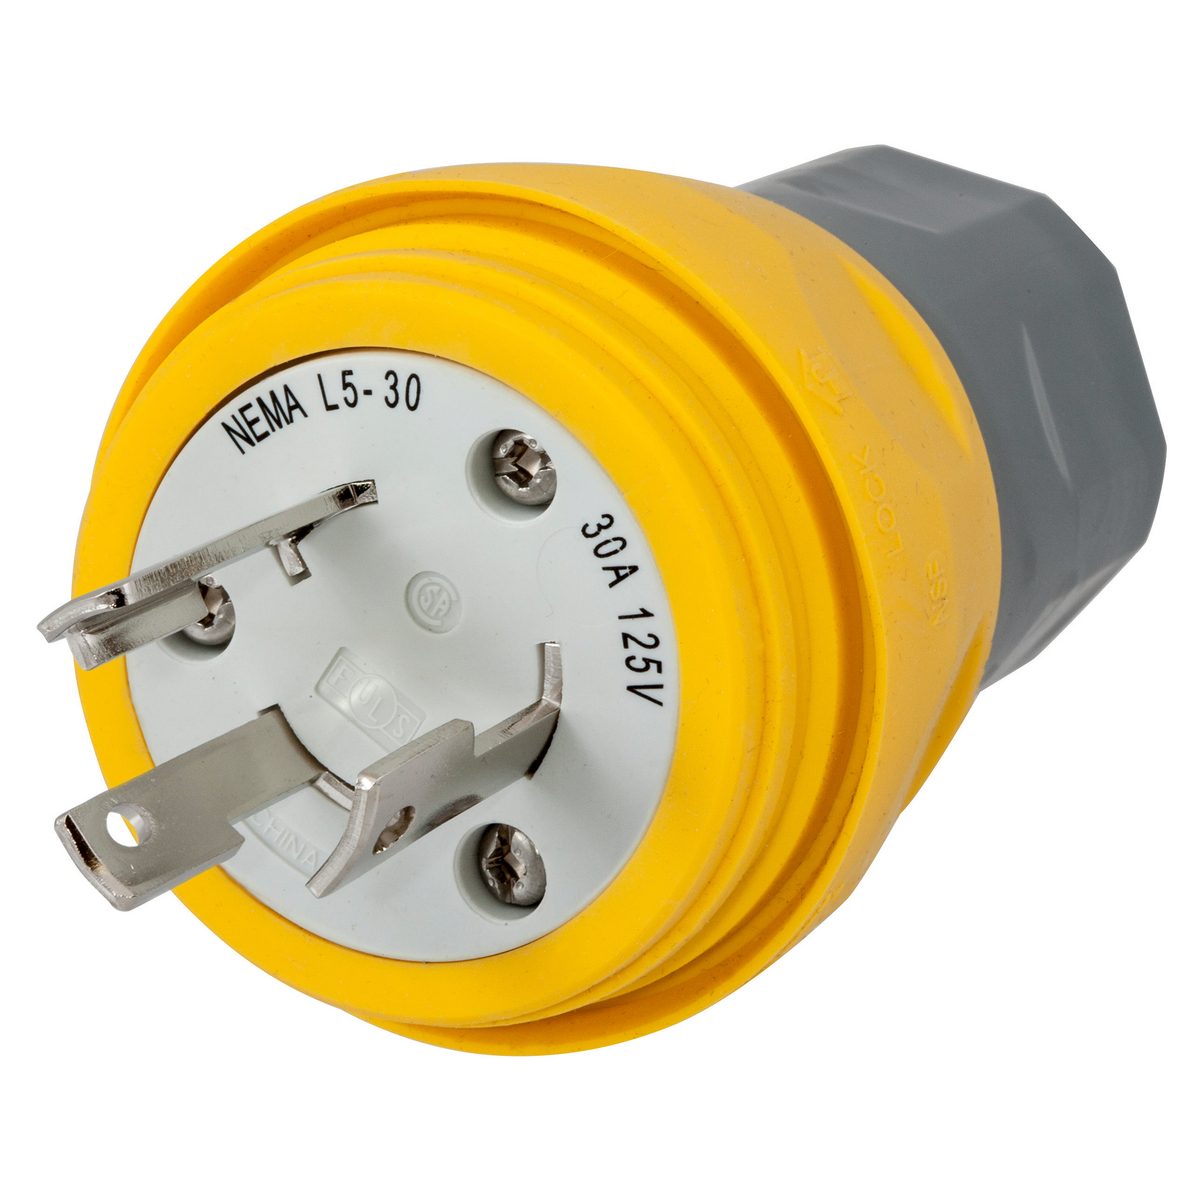 Hubbell HBL28W47 Plug, NEMA L5-30P, 30A 125V, YL